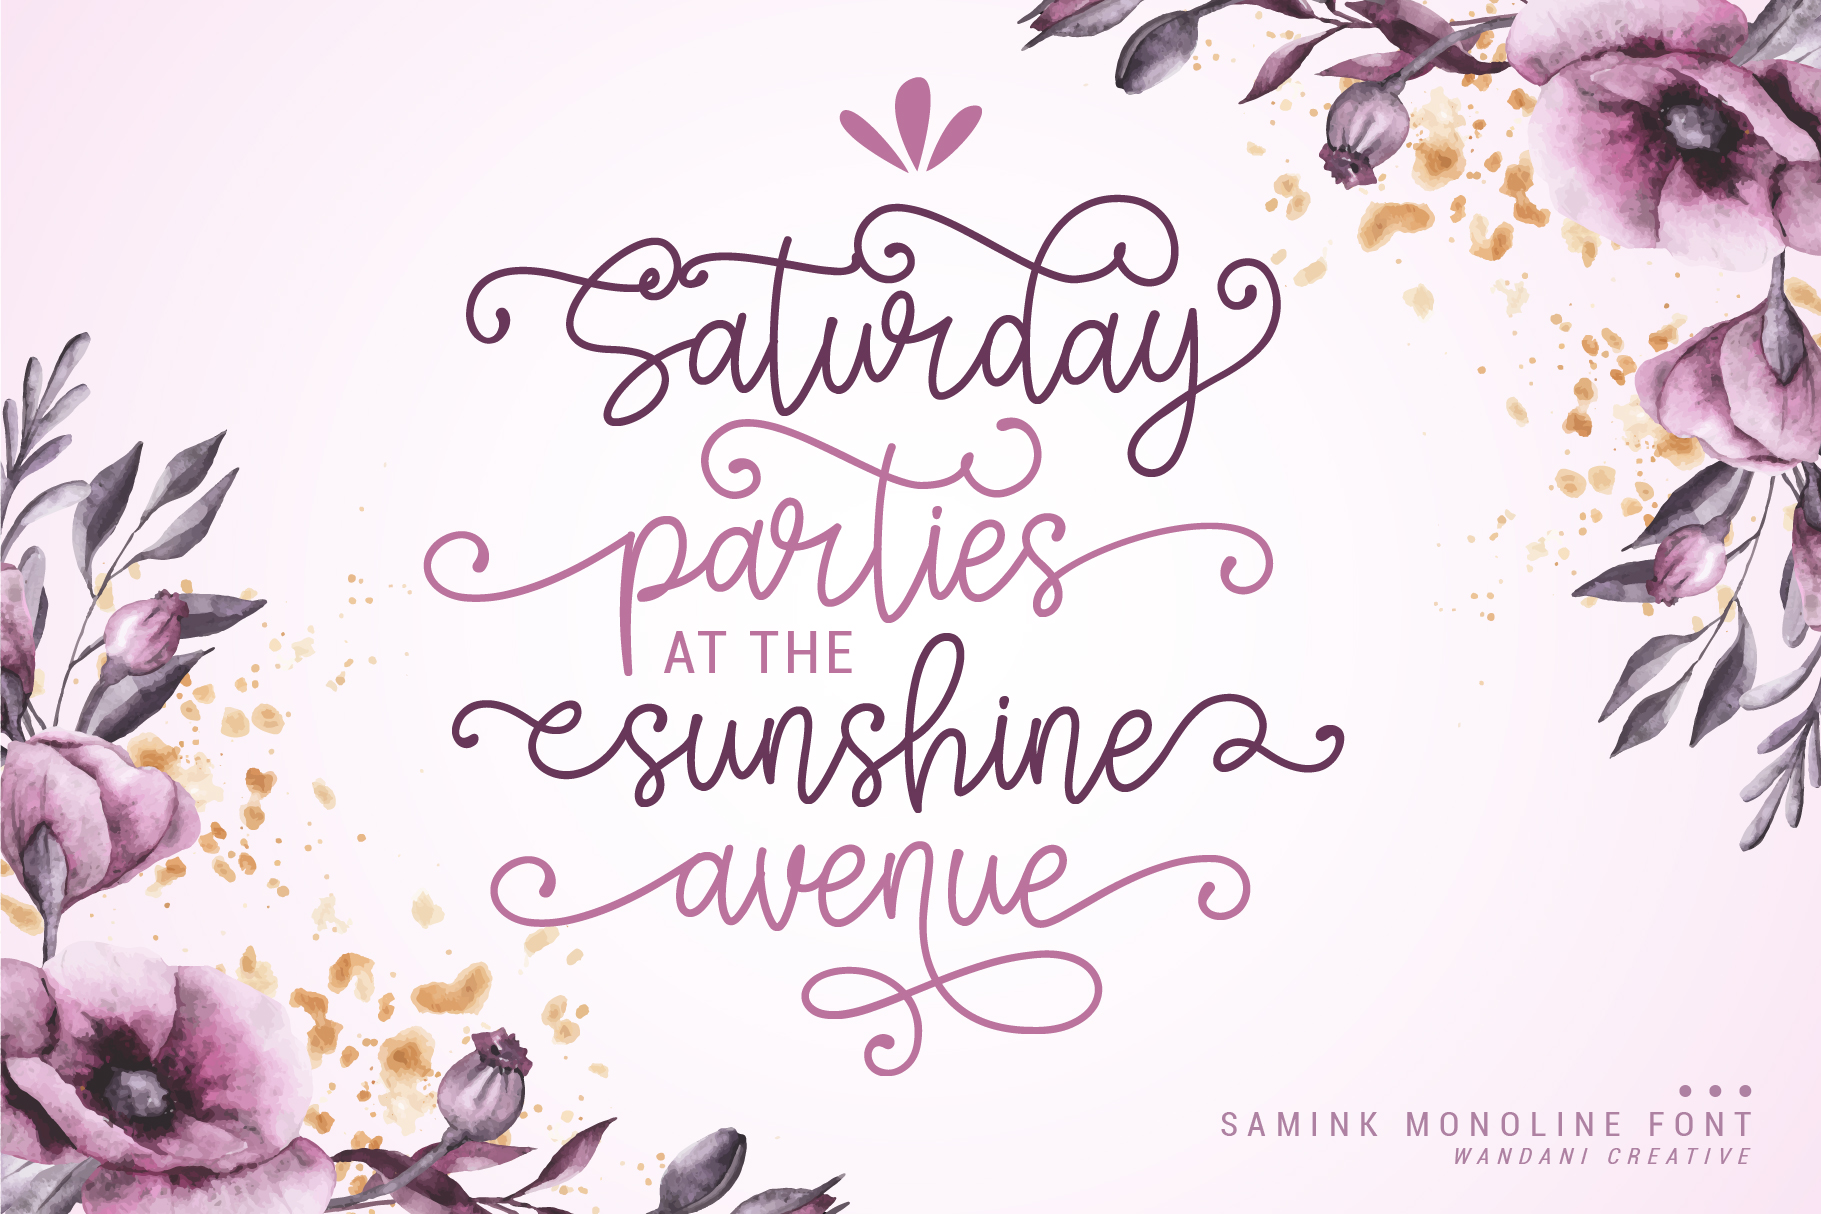 Samink Monoline font & Extras example image 2